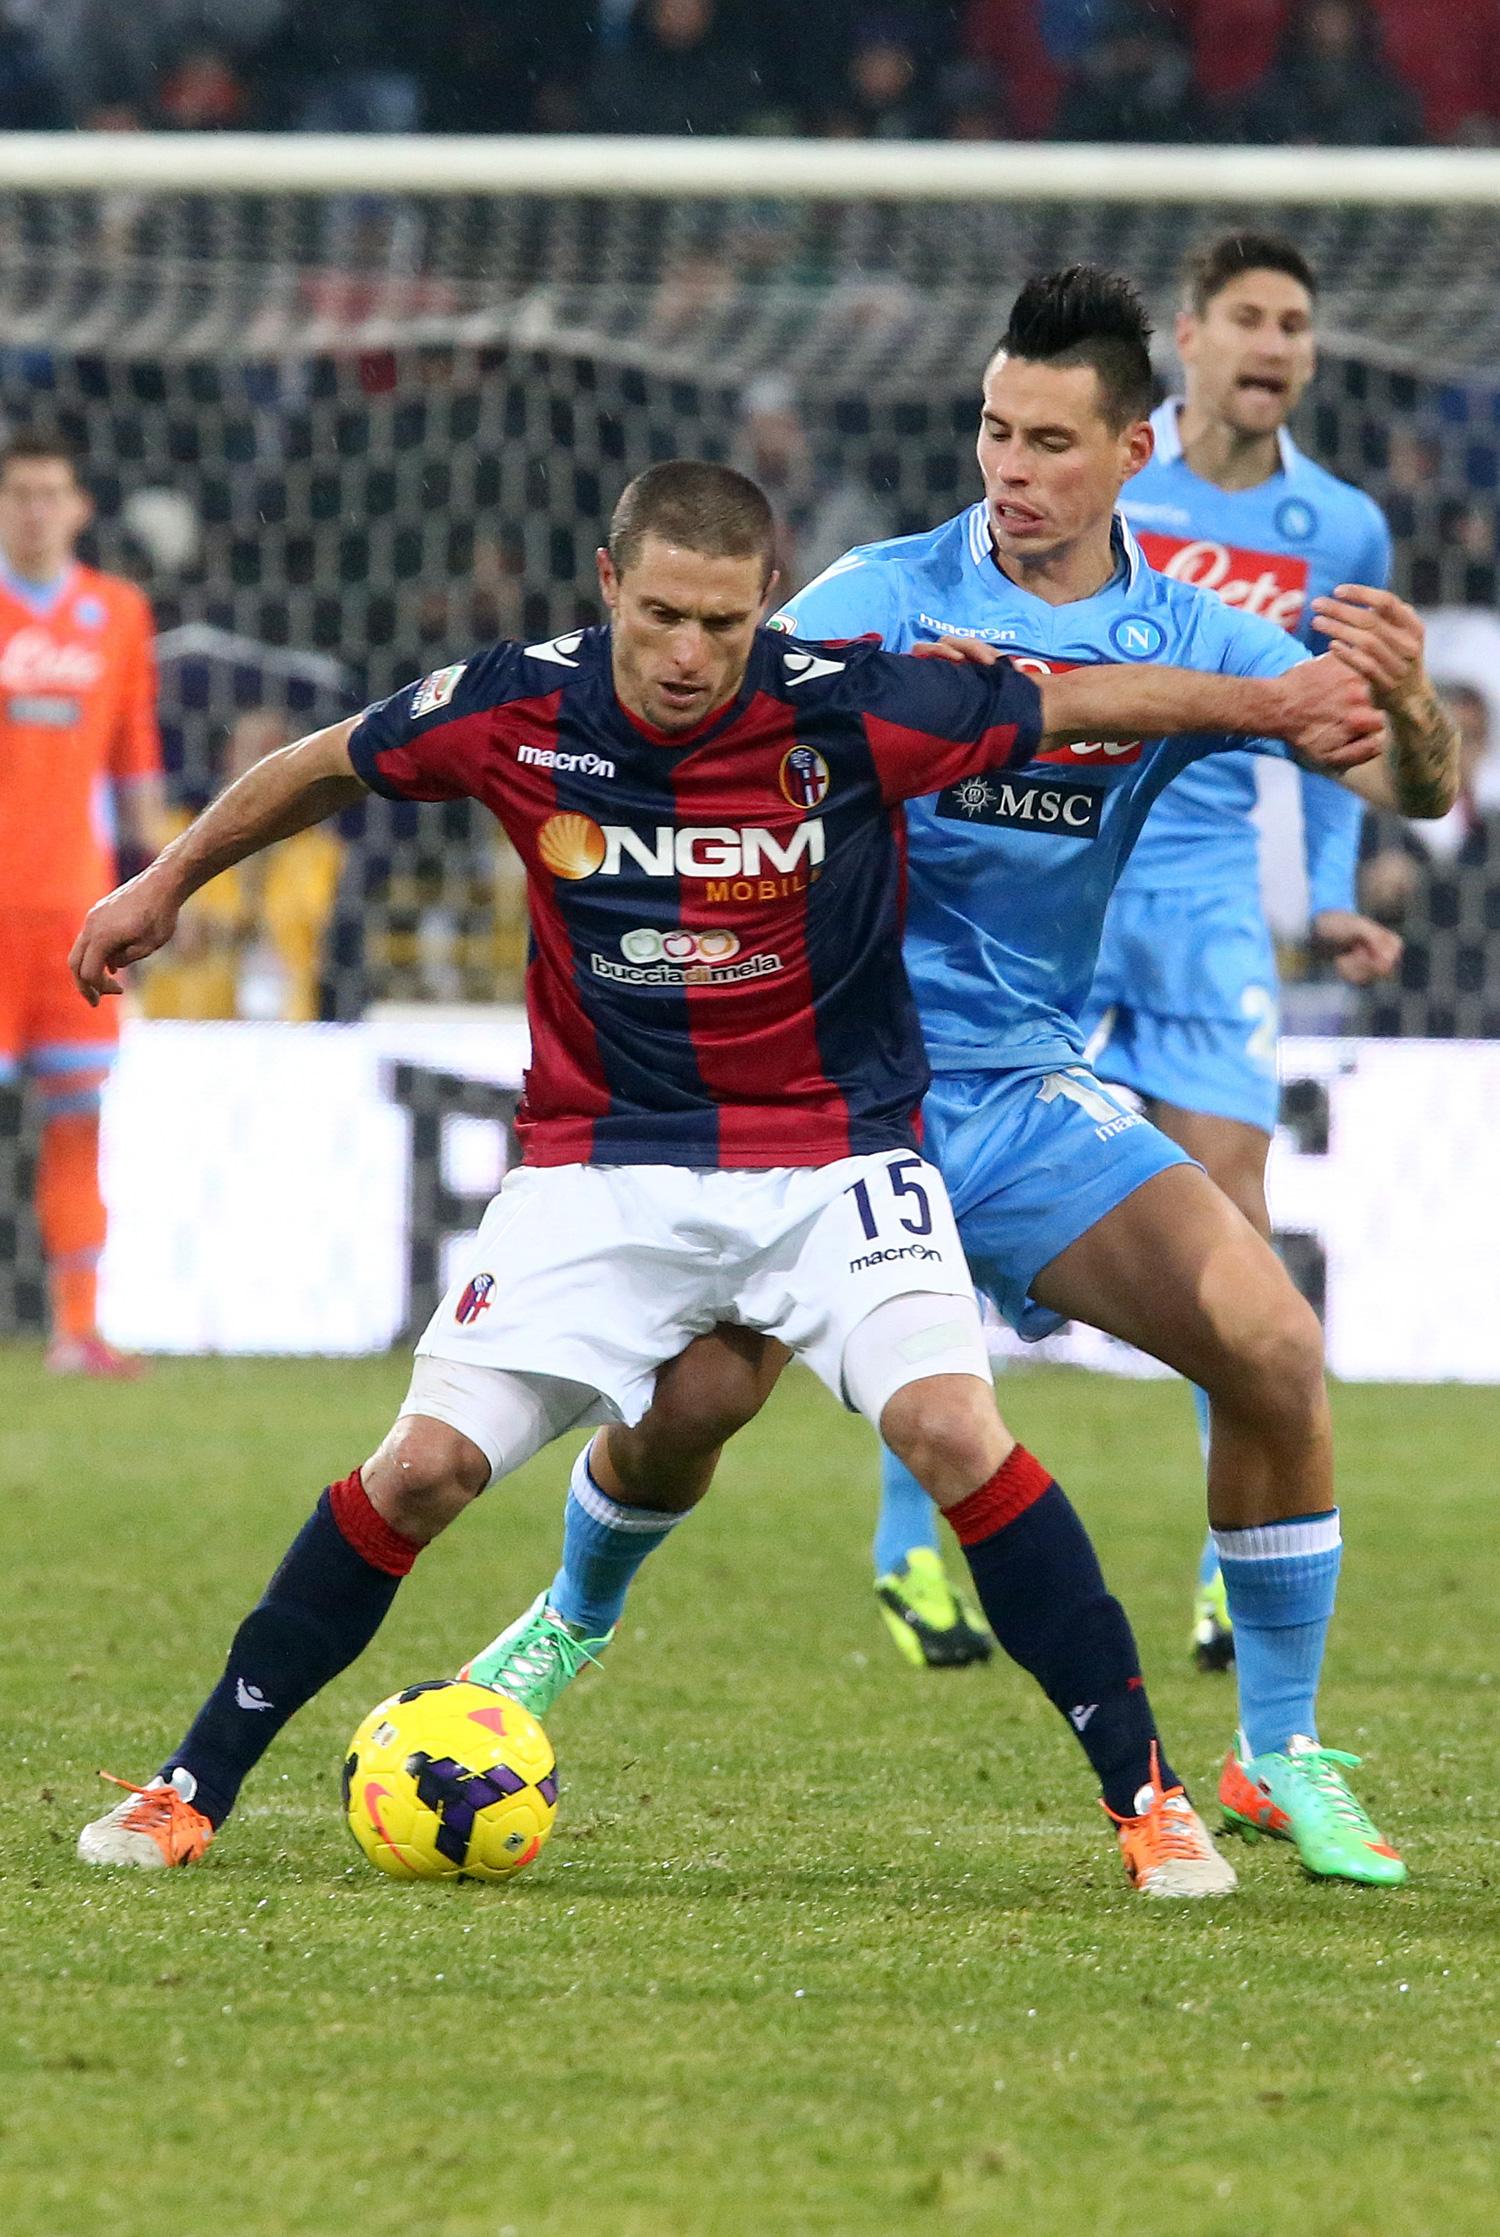 Napoli anuncia brasileiro, mas cede empate para o Bologna. Inter perde